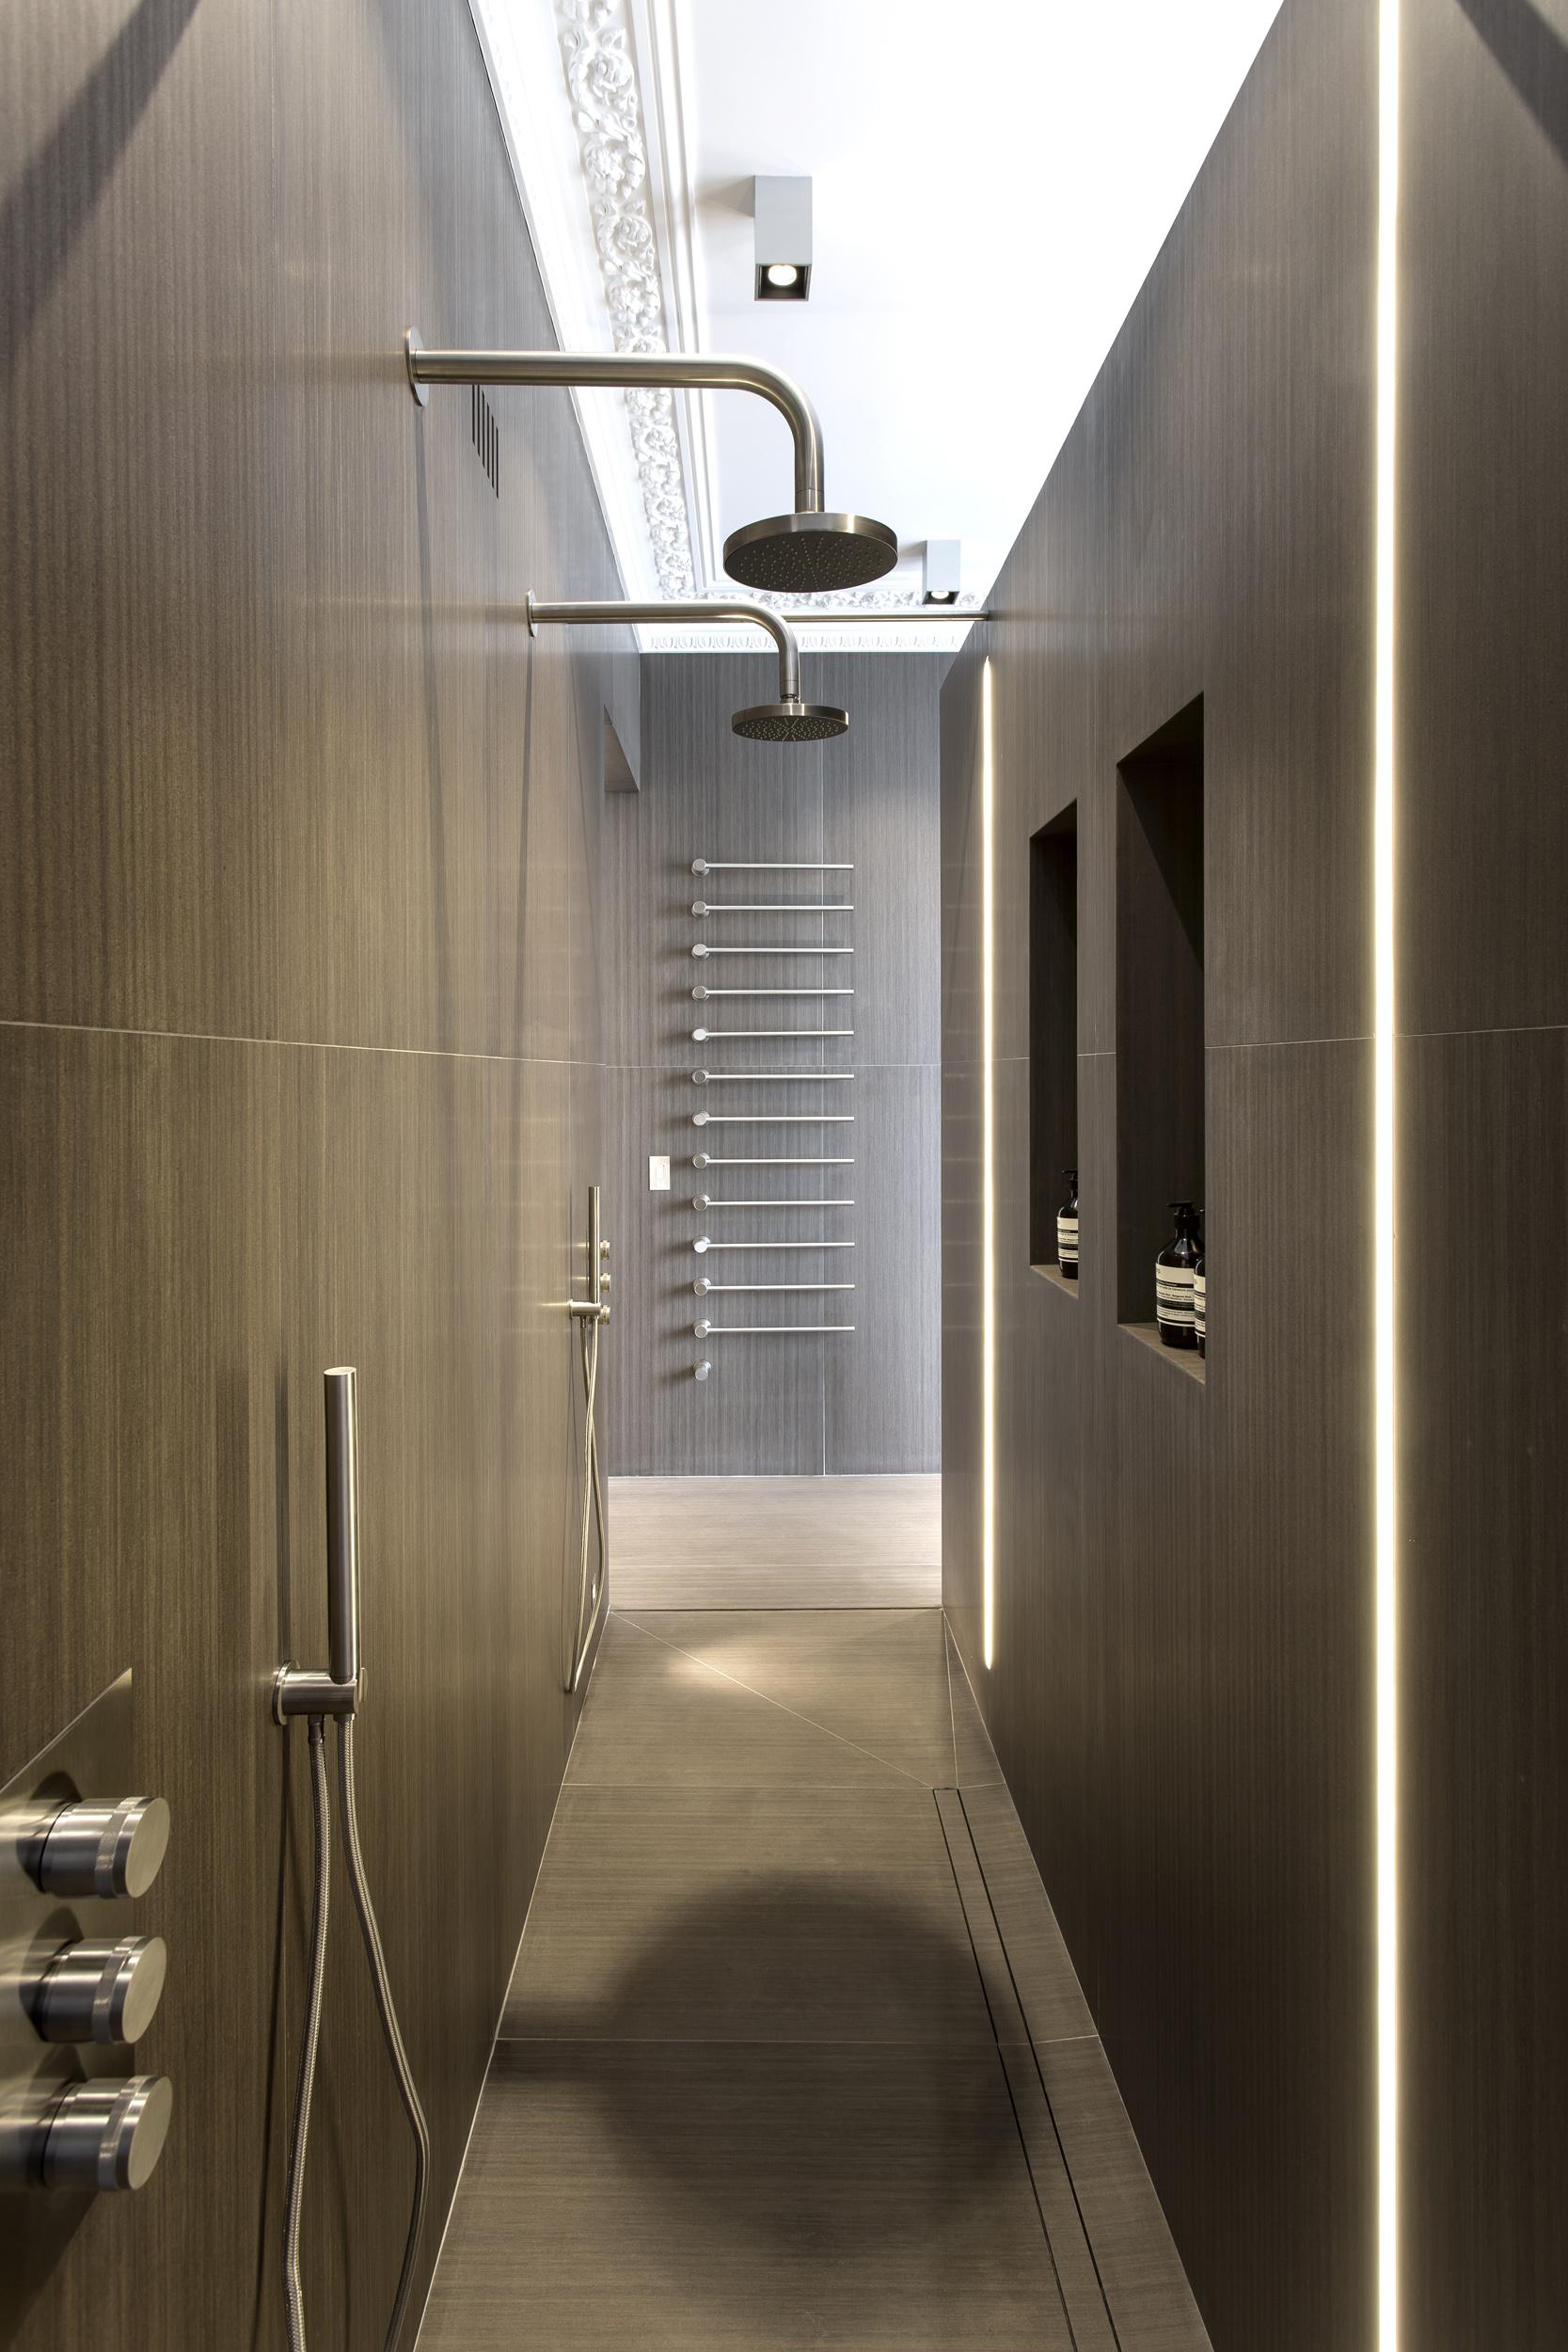 05_First_Bathroom1_Shower01-9928.jpg